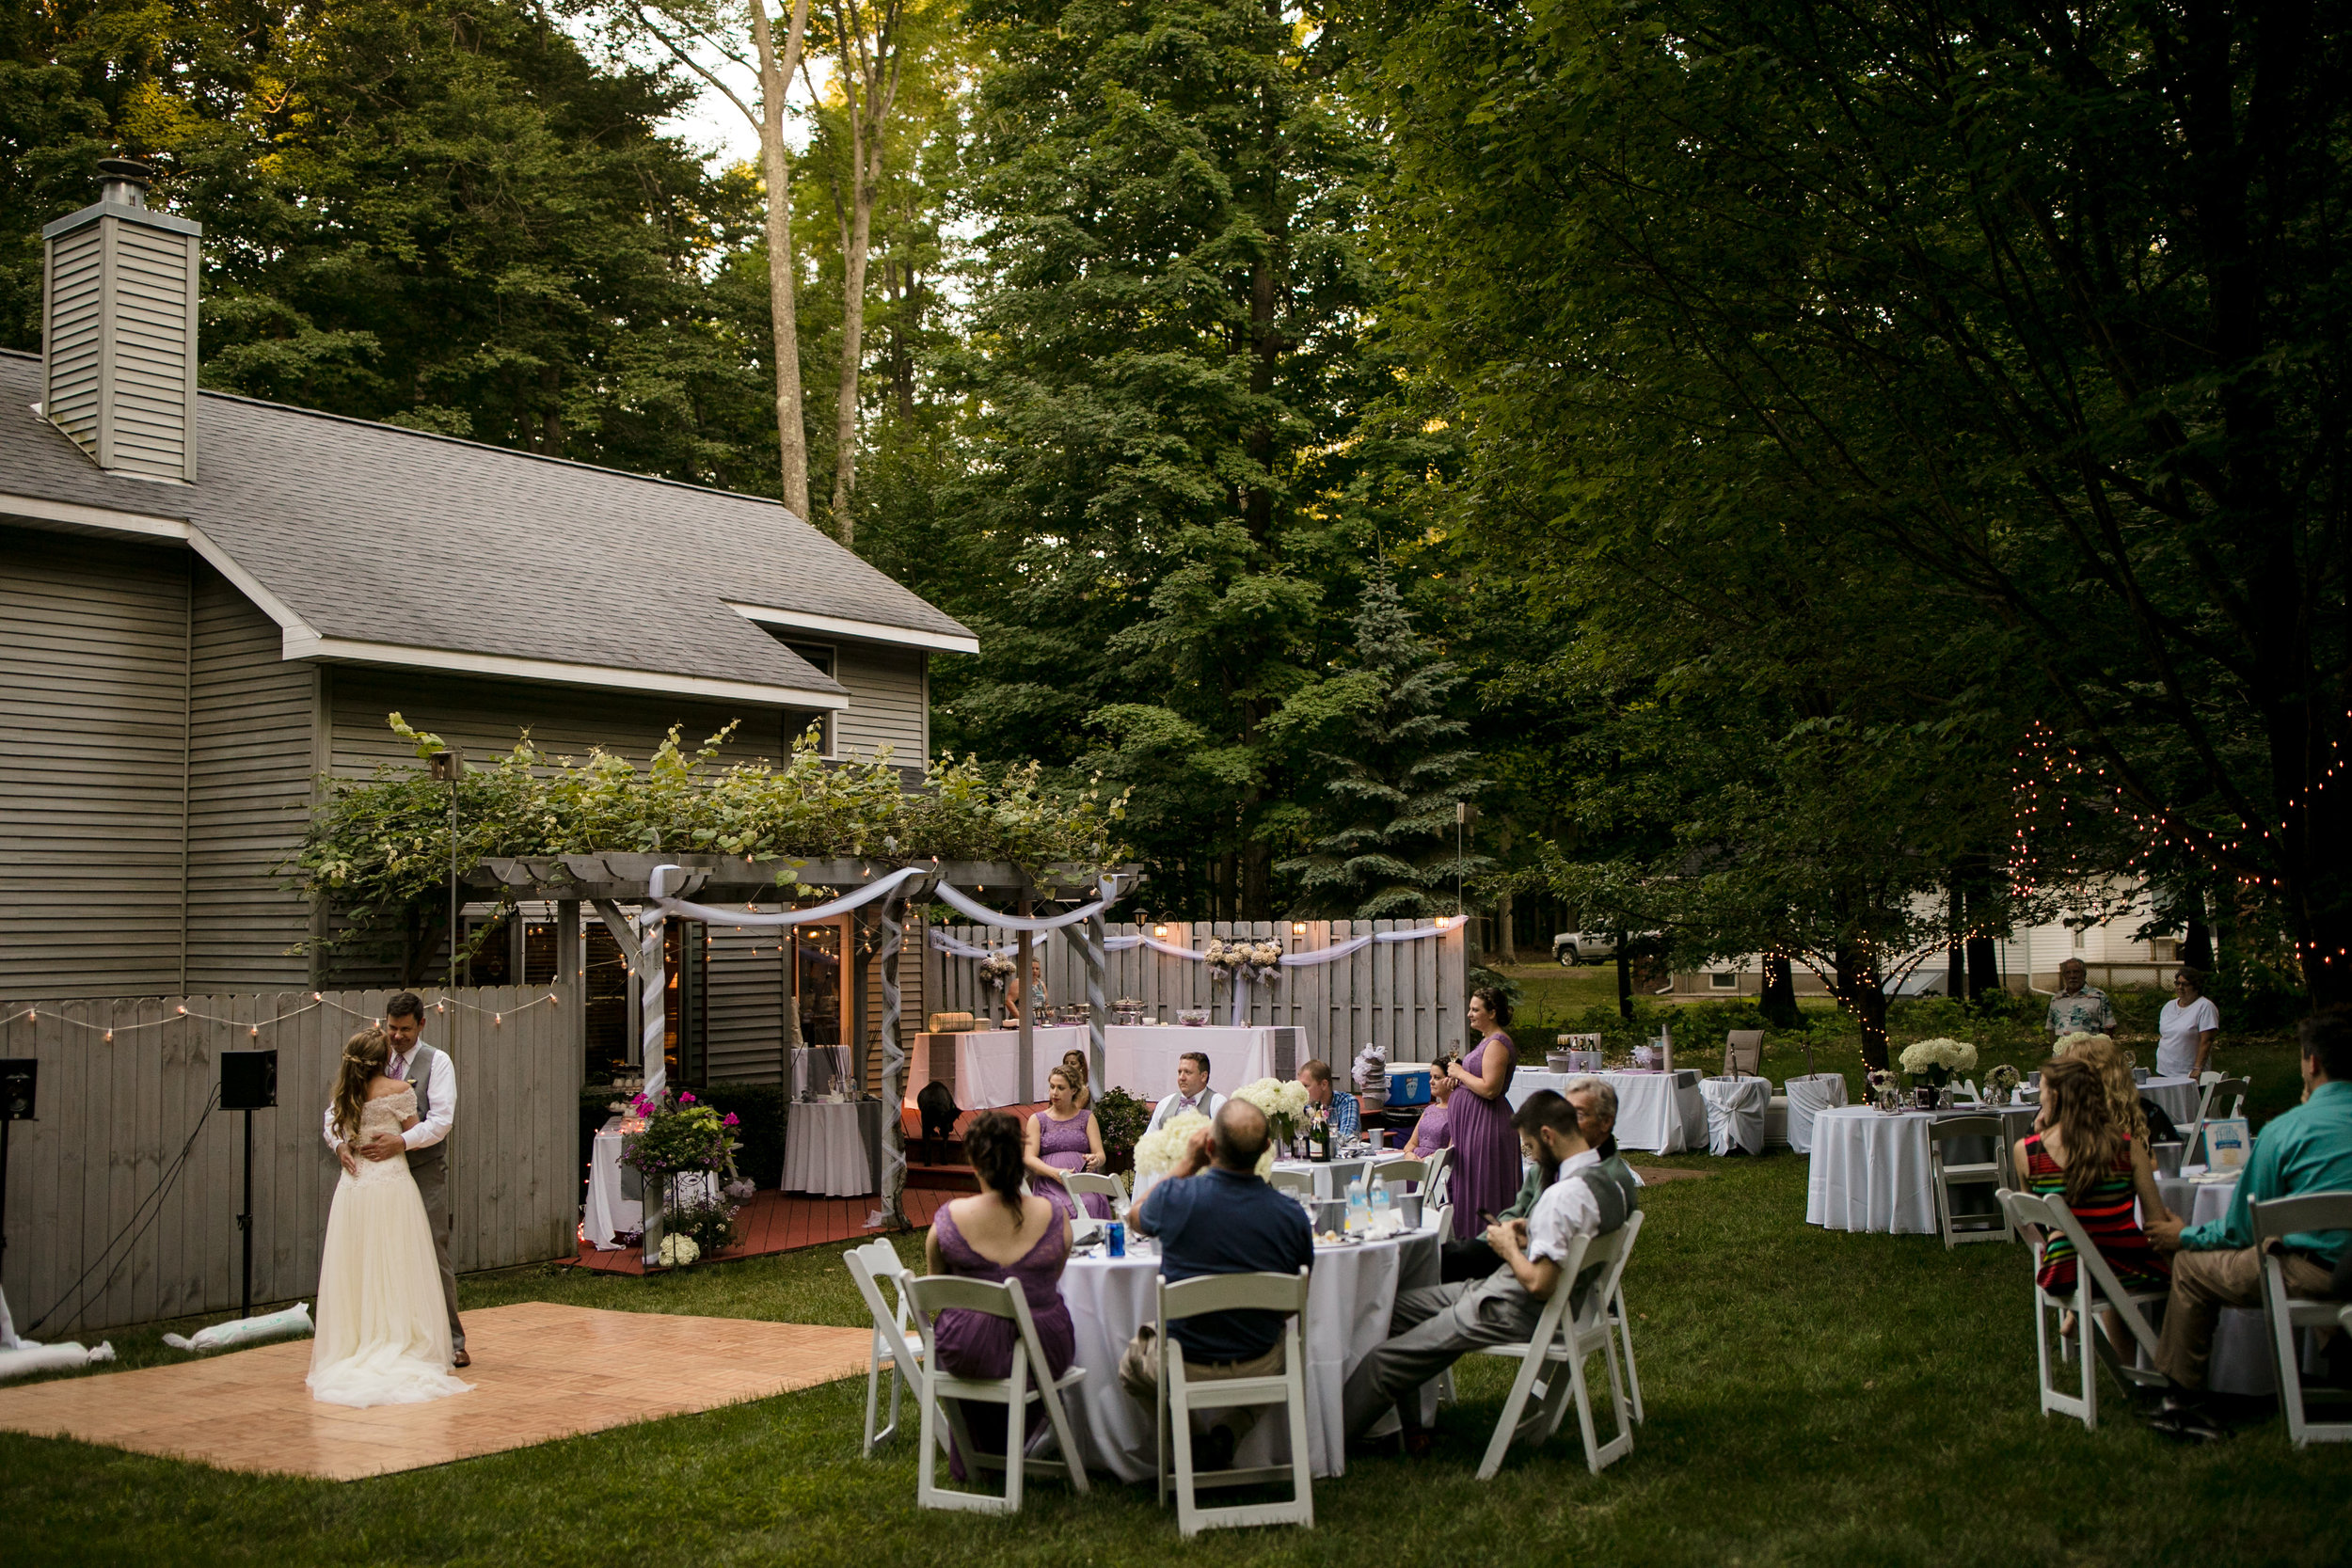 ludington-michigan-intimate-backyard-wedding-jessica-nolan455.jpg